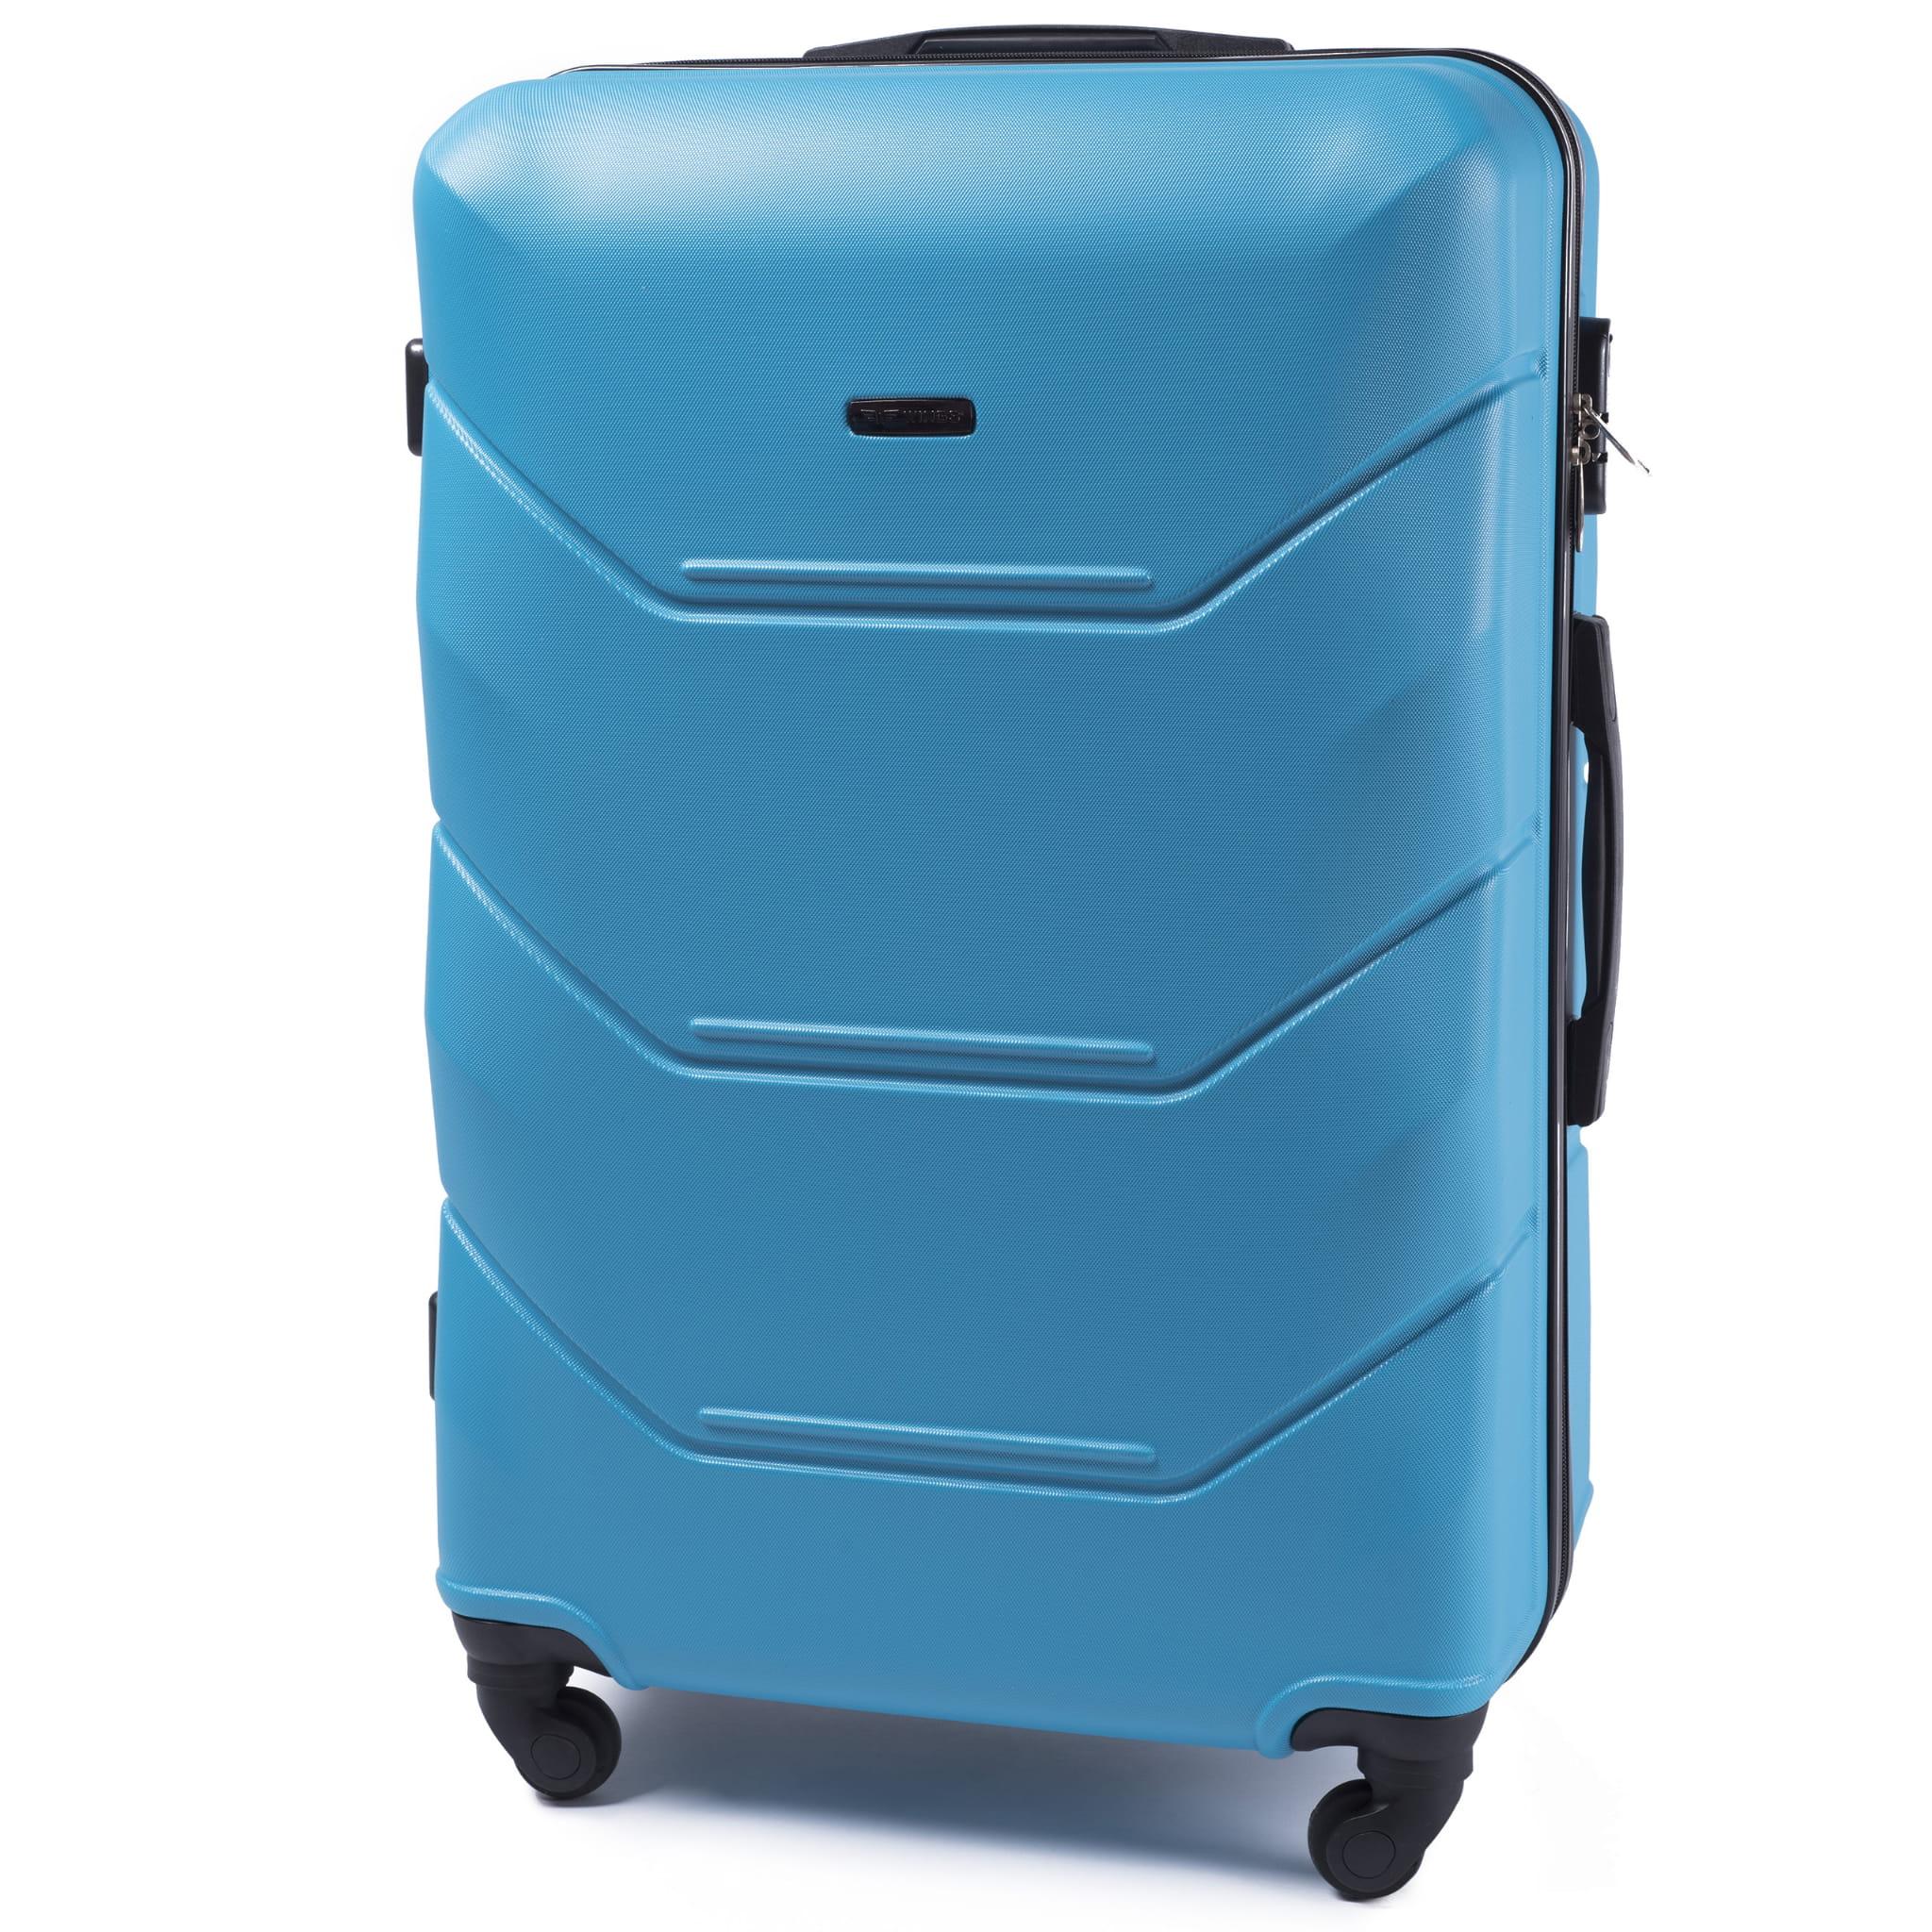 БОЛЬШОЙ ЧЕМОДАН WINGS 147 L Cyan  PREMIUM НА 4-Х КАУЧУКОВЫХ КОЛЕСАХ! Для багажа ,до 23 кг!